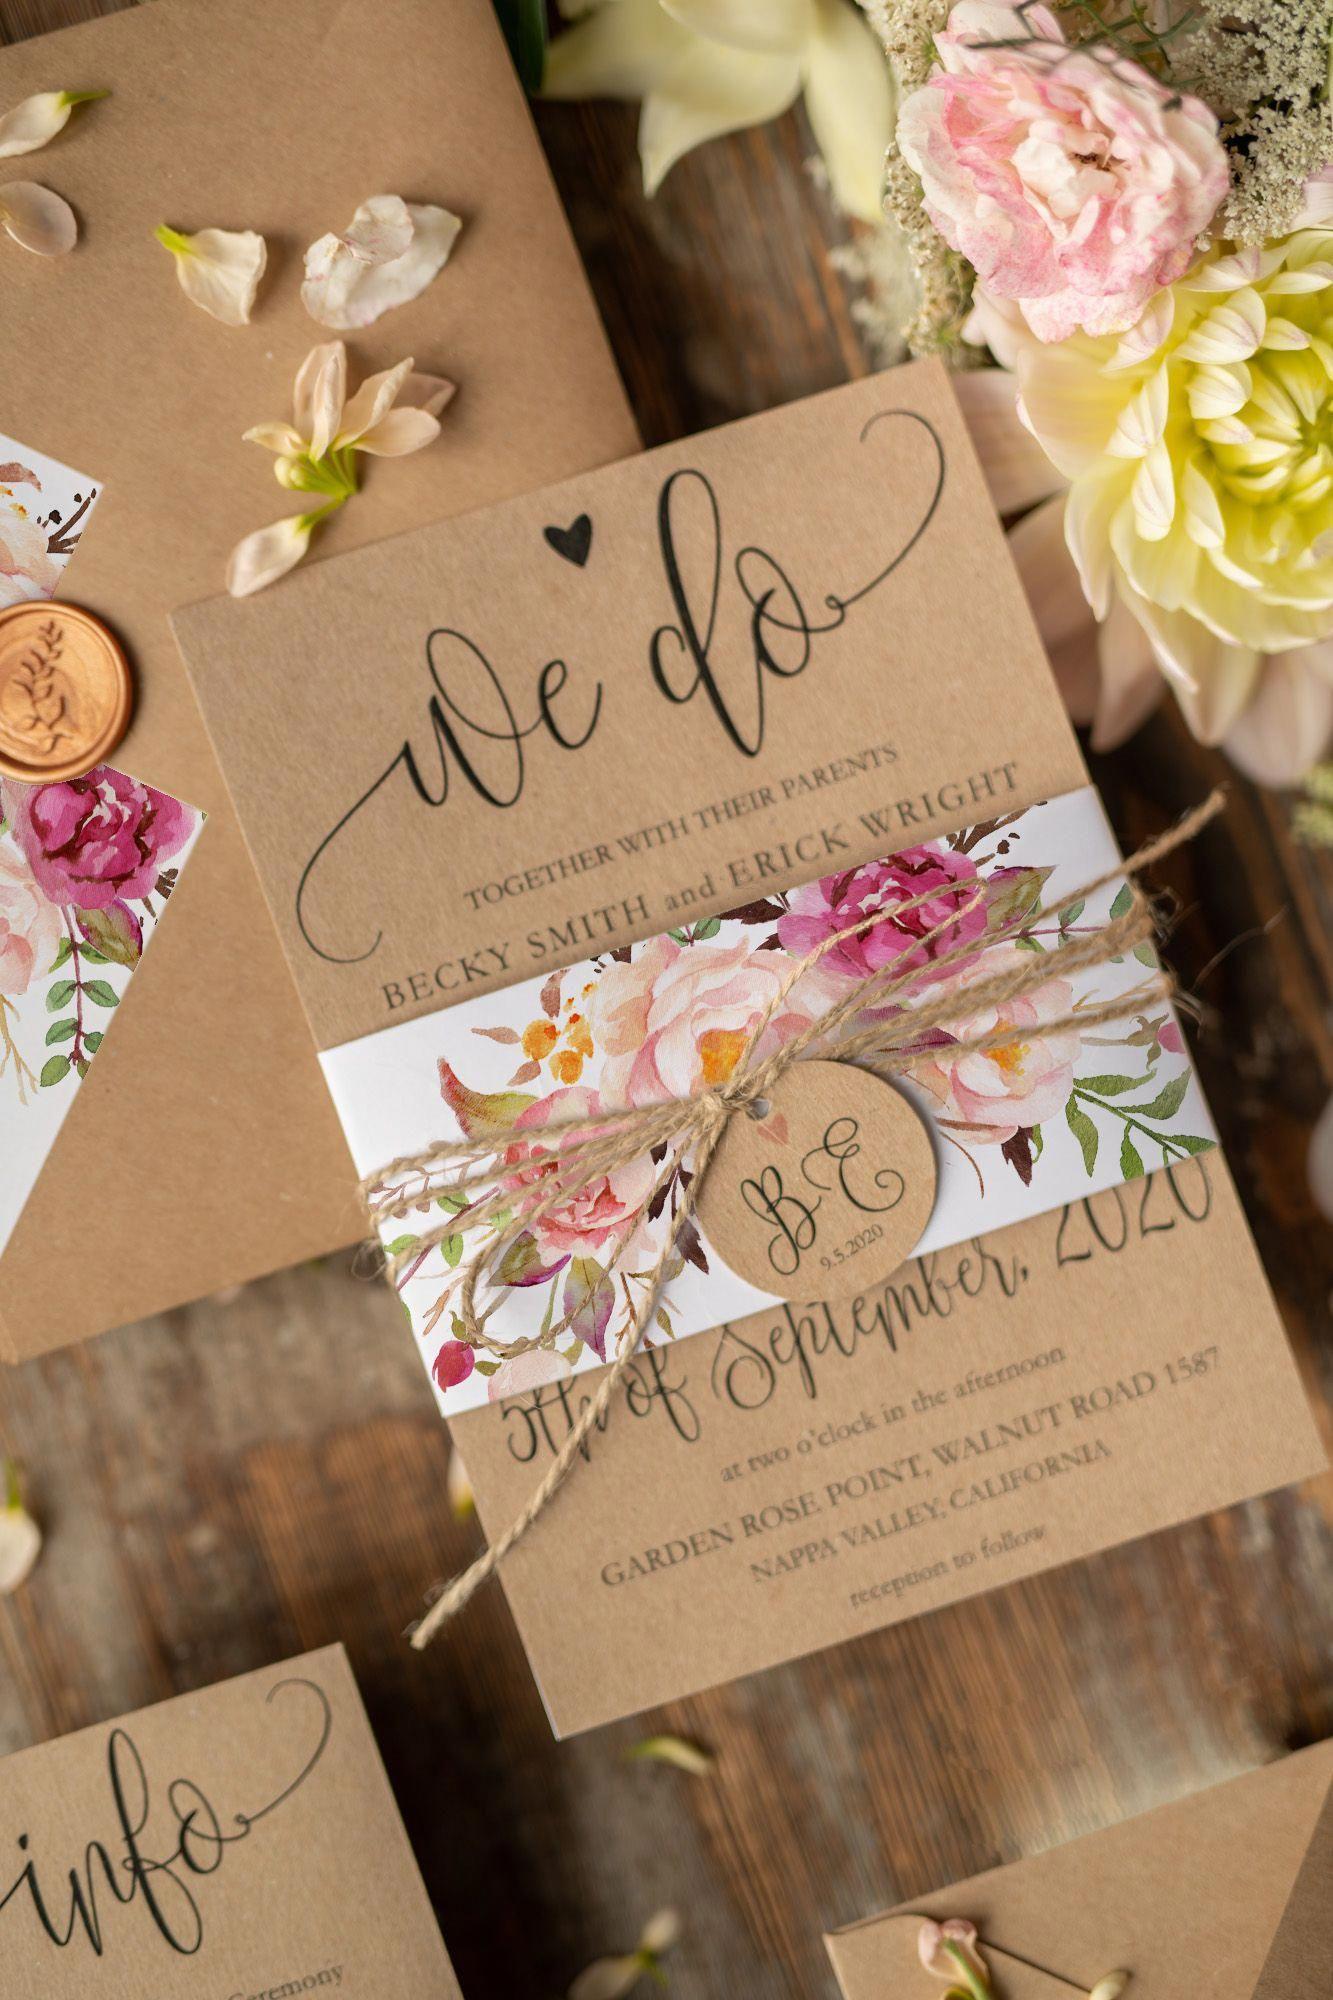 Wedding Invitations 001 Wcg Z Weddingtiips Wedding Invitations Diy Country Wedding Invitations Handmade Wedding Invitations